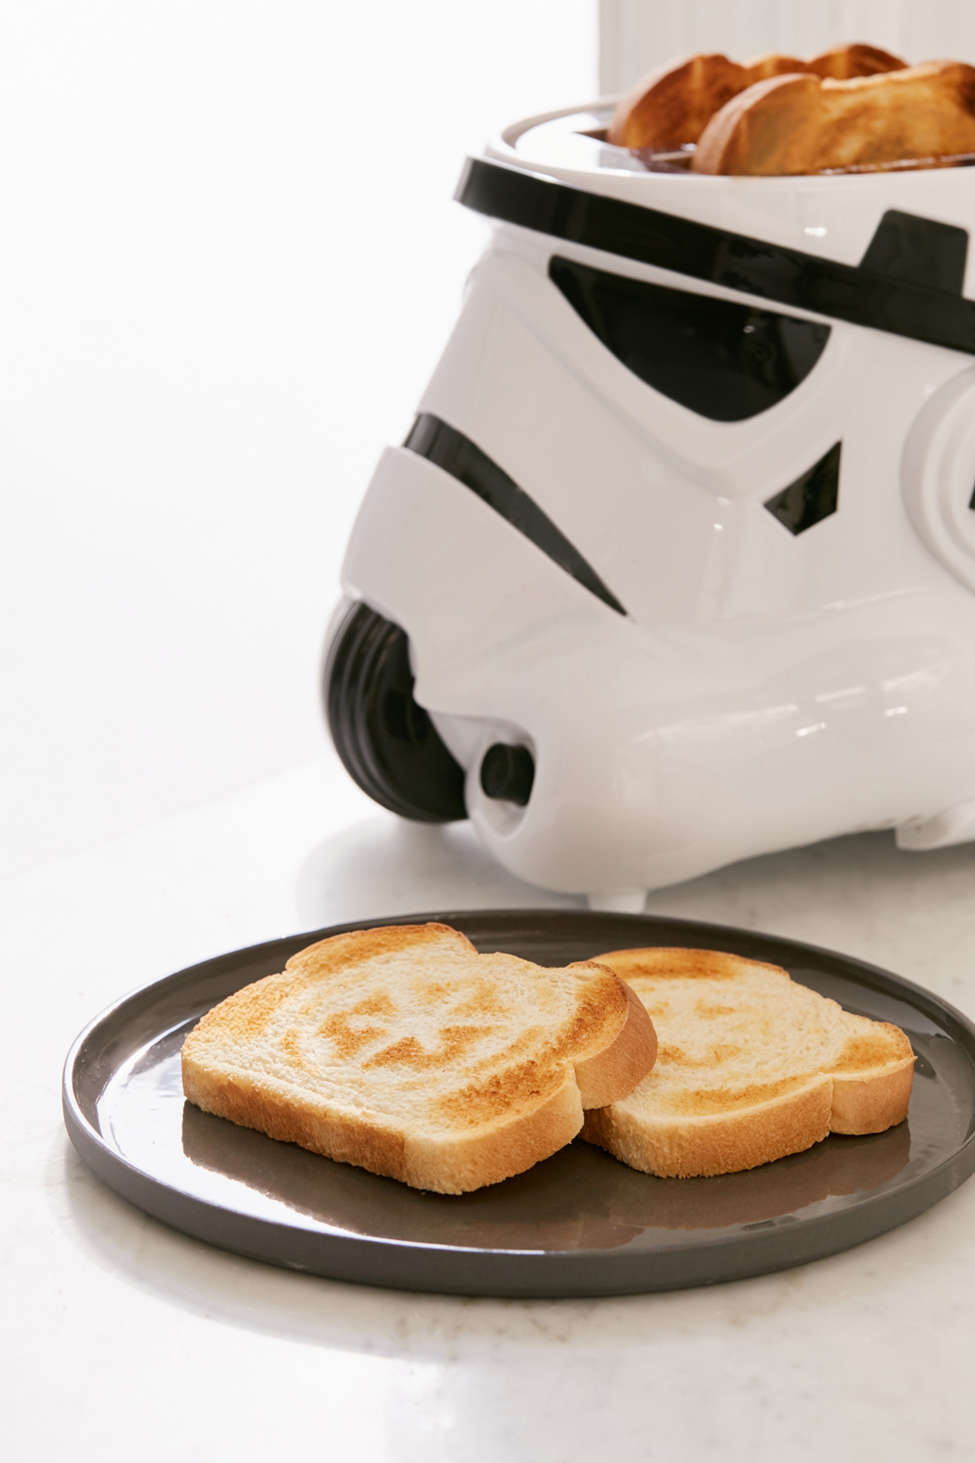 Slide View: 2: Star Wars Stormtrooper Toaster